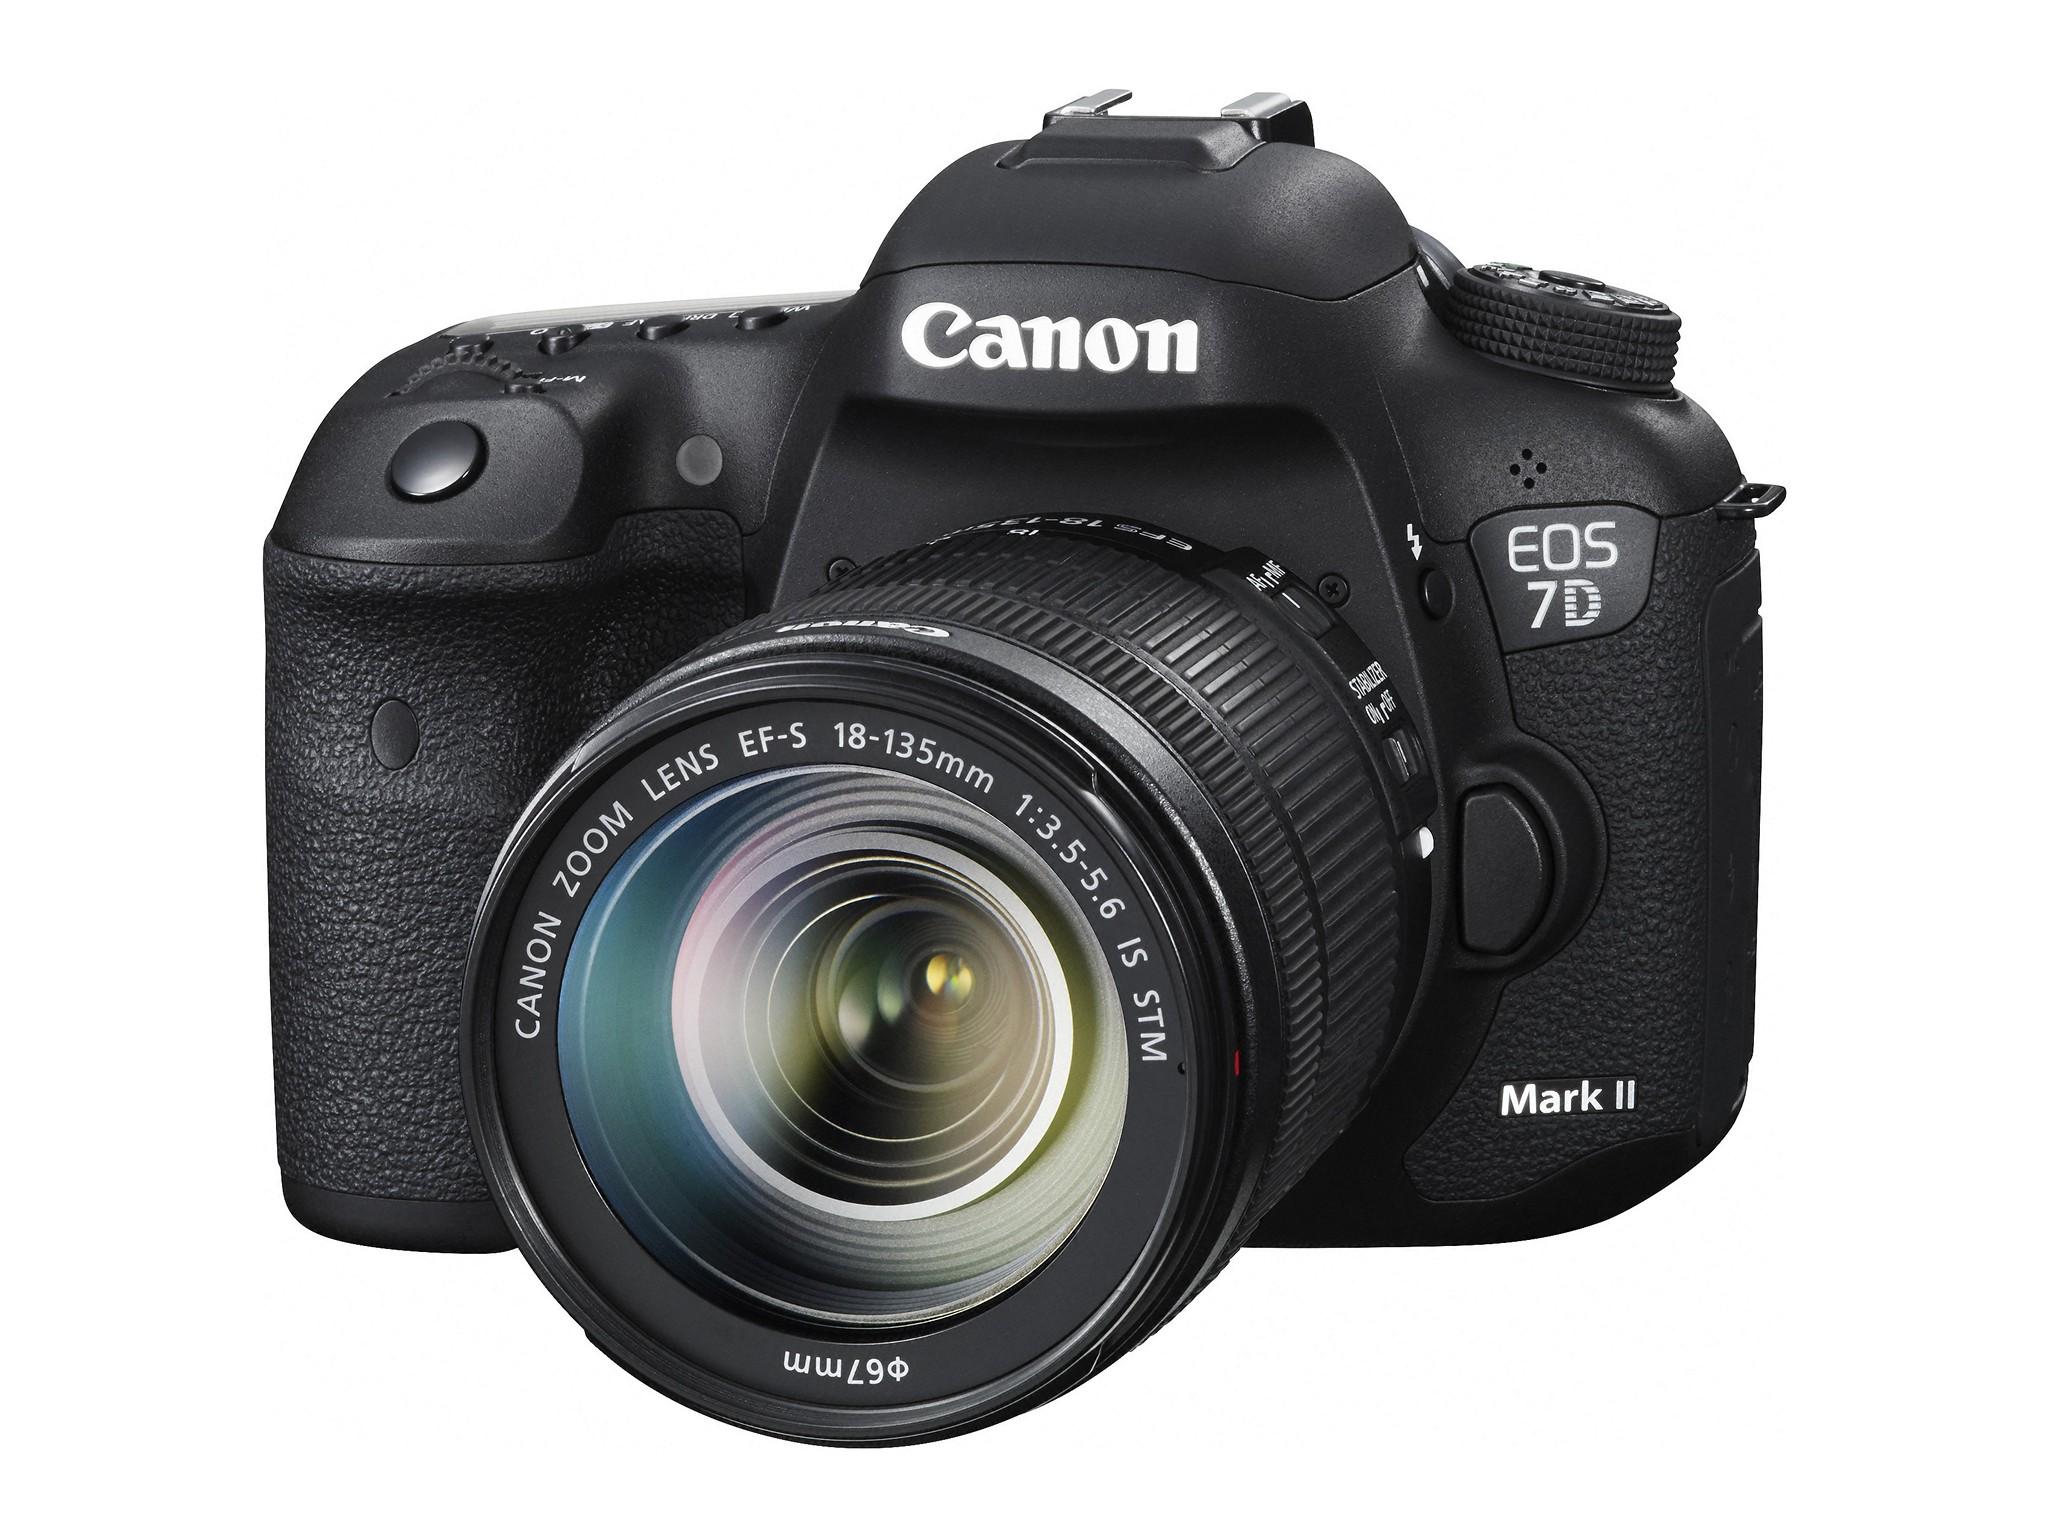 Goondu review: Canon EOS 7D Mark II - Techgoondu Techgoondu